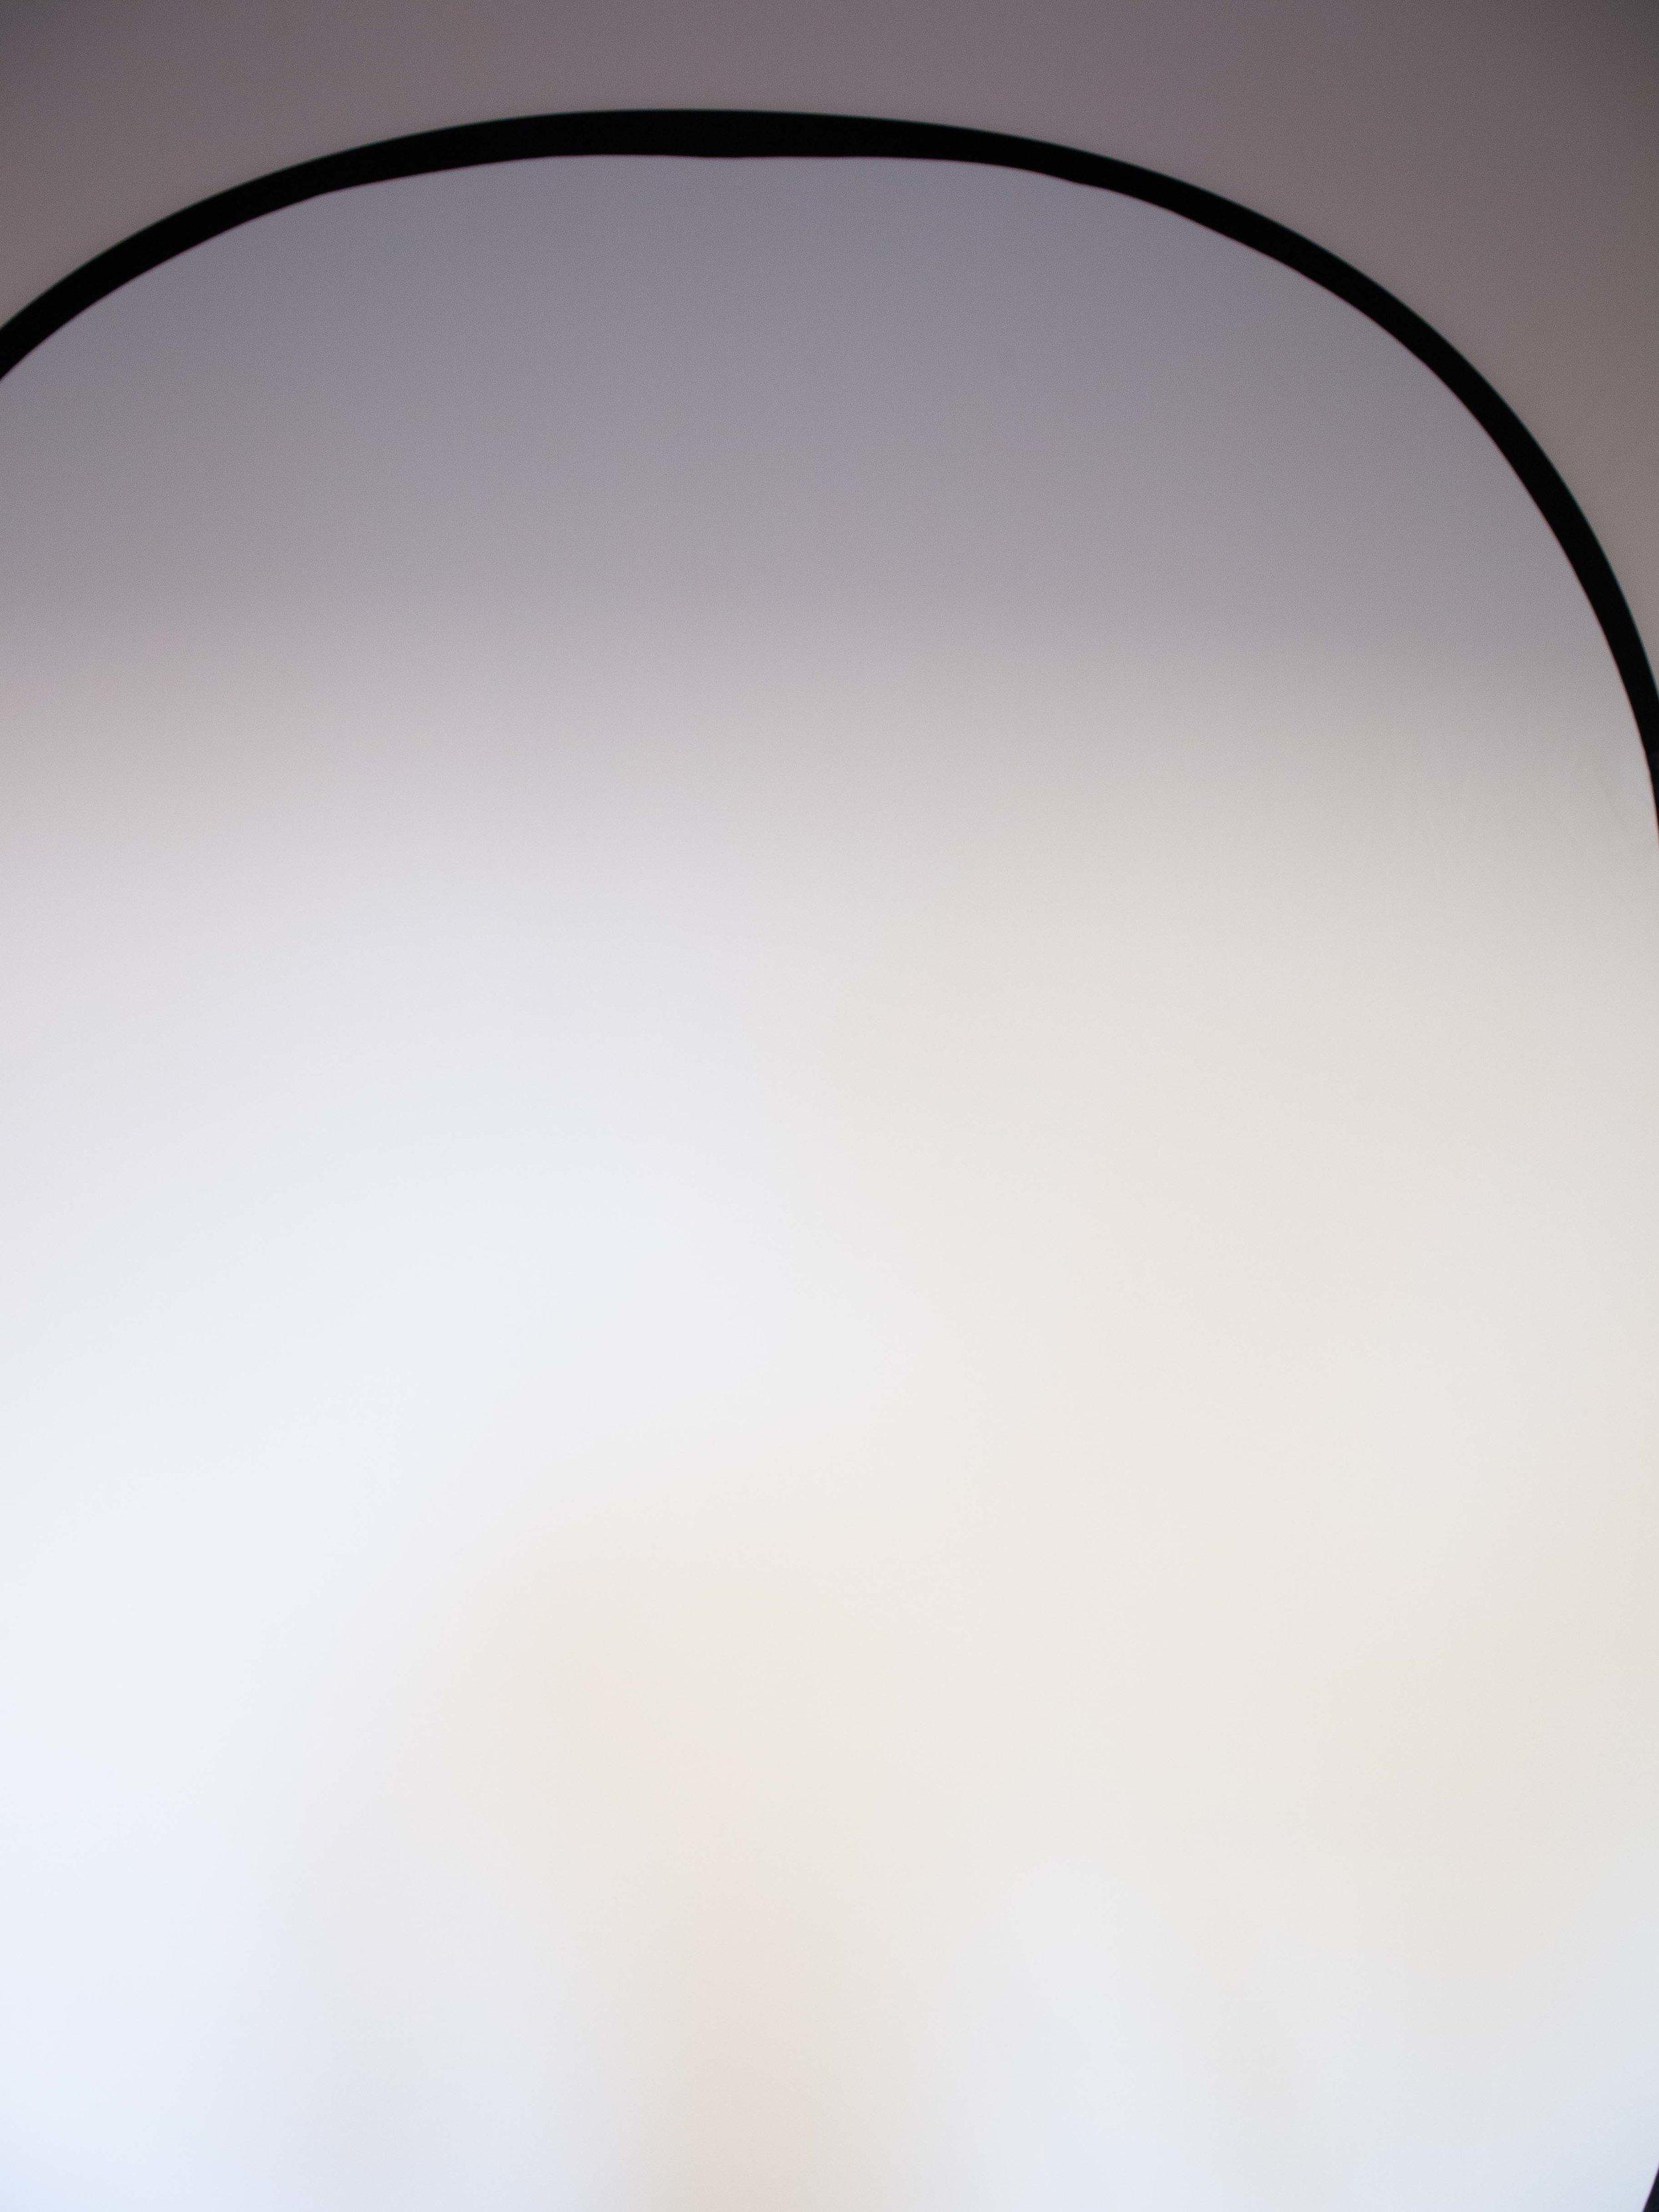 Filter Test Cokin vs 84.5mm (4 of 6).jpg